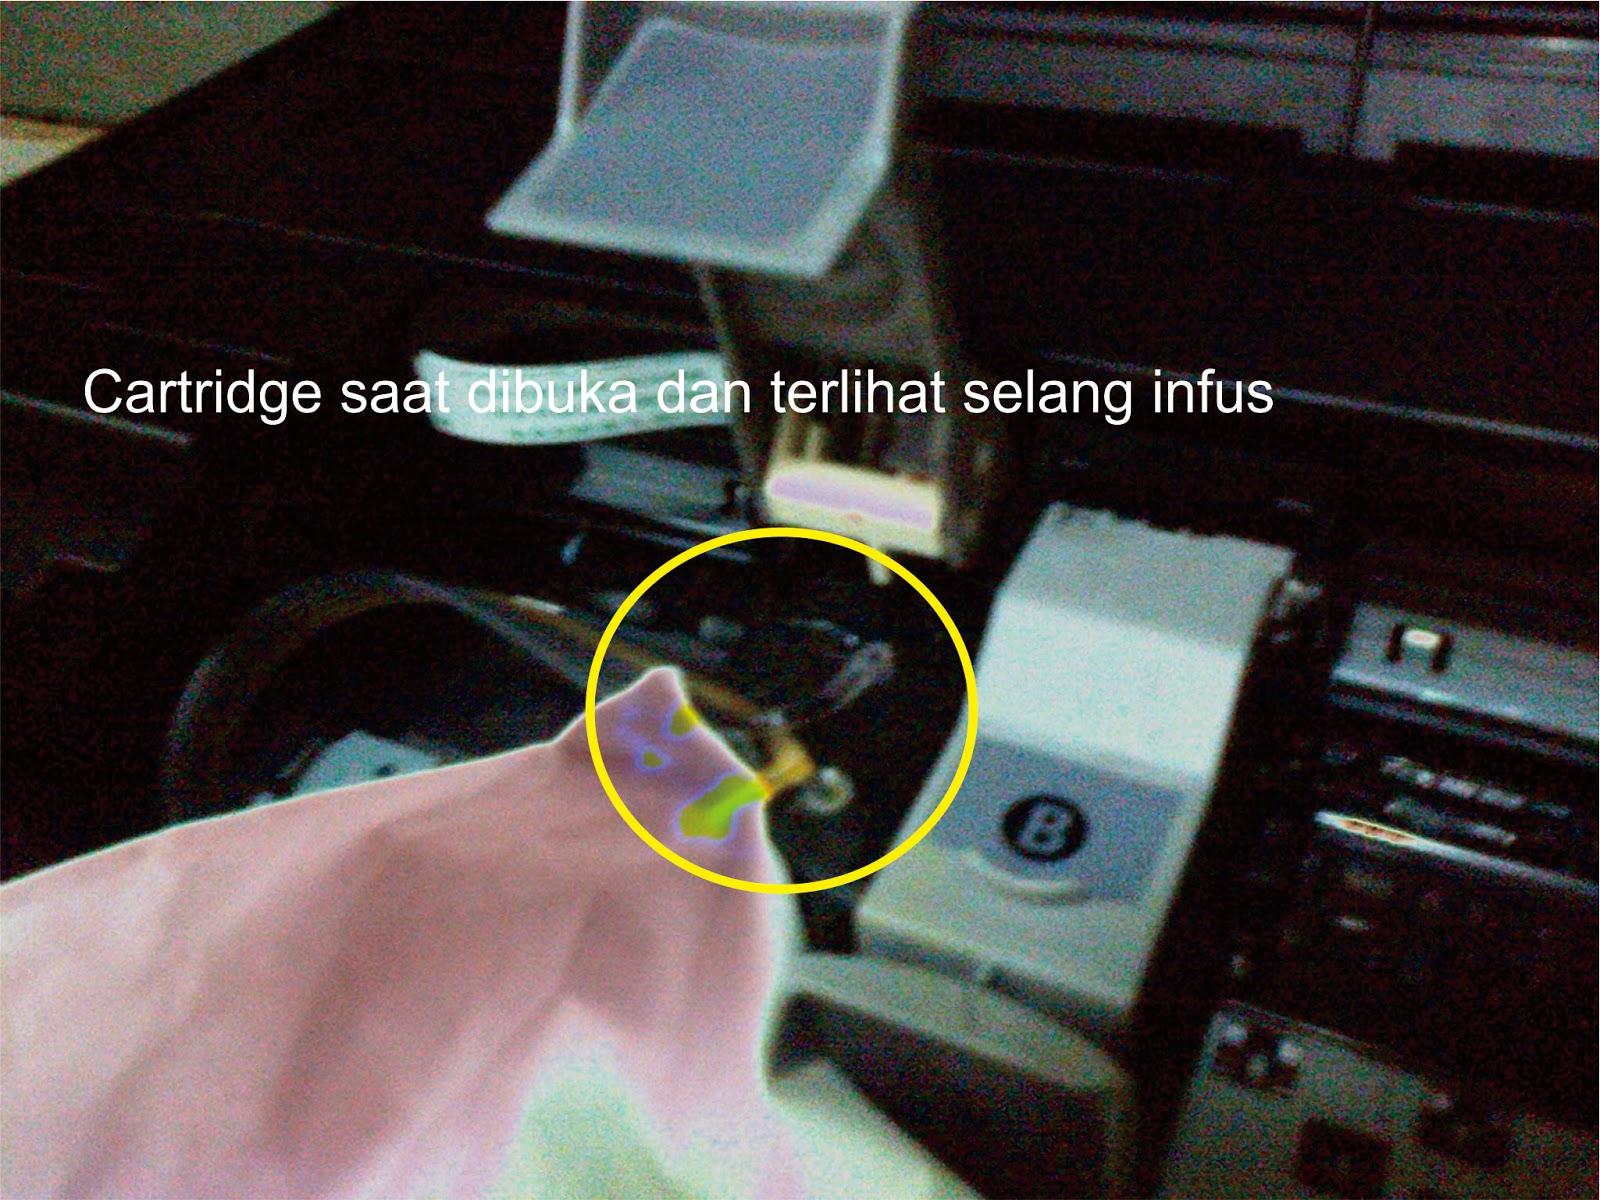 Harga Cartridge Canon ip2770 · Lampu indikator printer berkedip saat ...